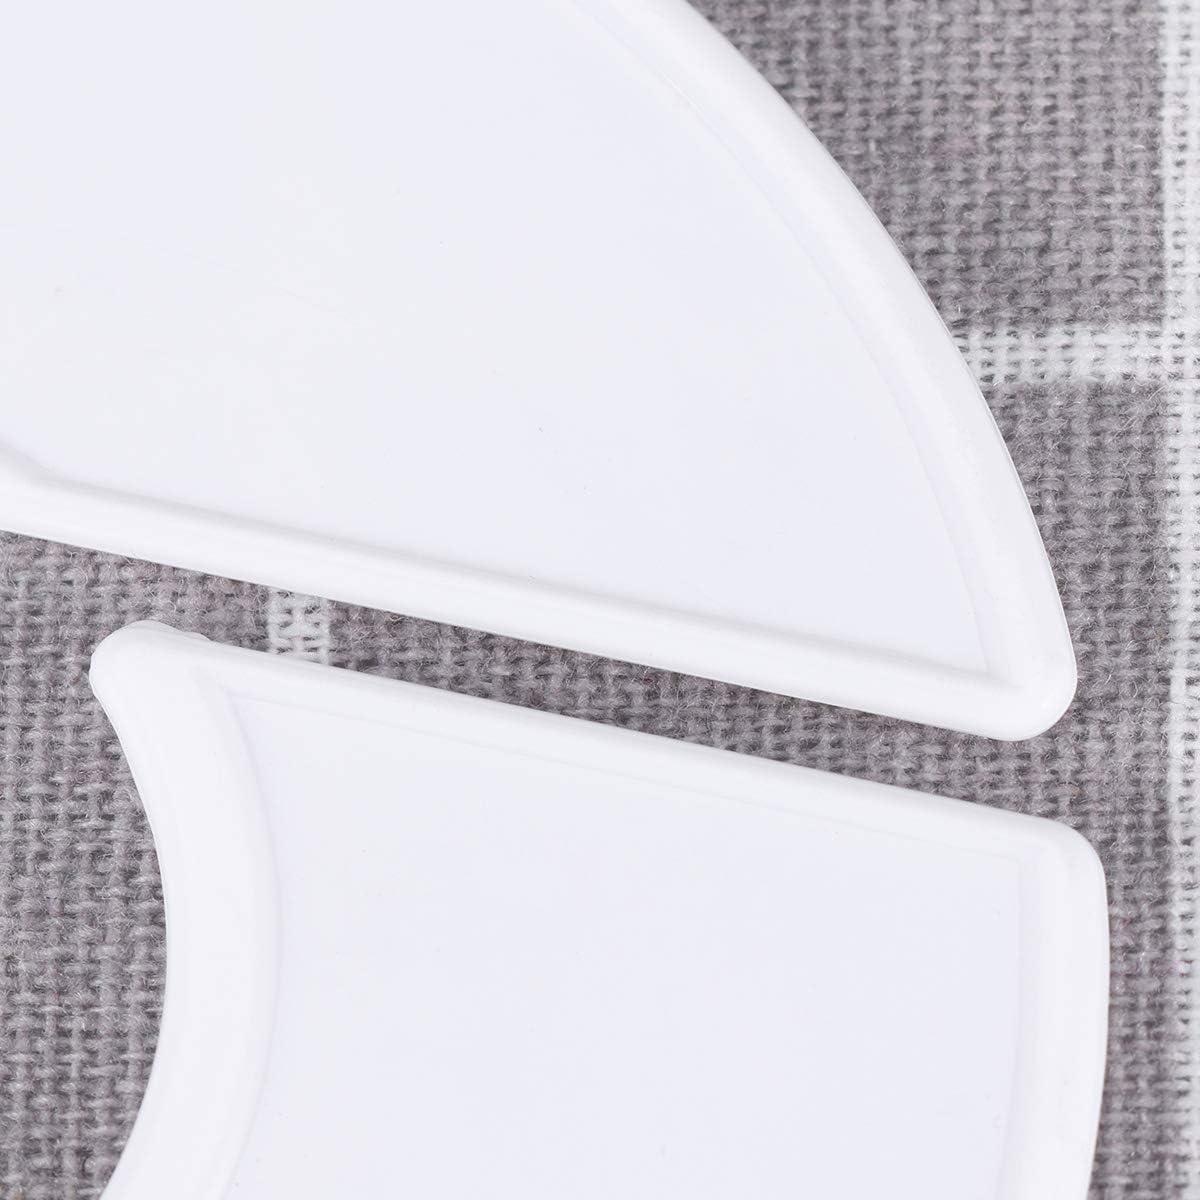 VOSAREA 10pcs Clothing Size Divider Plastic Round Hangers Dividers Blank DIY Closet Wardrobe Rack Size Dividers White